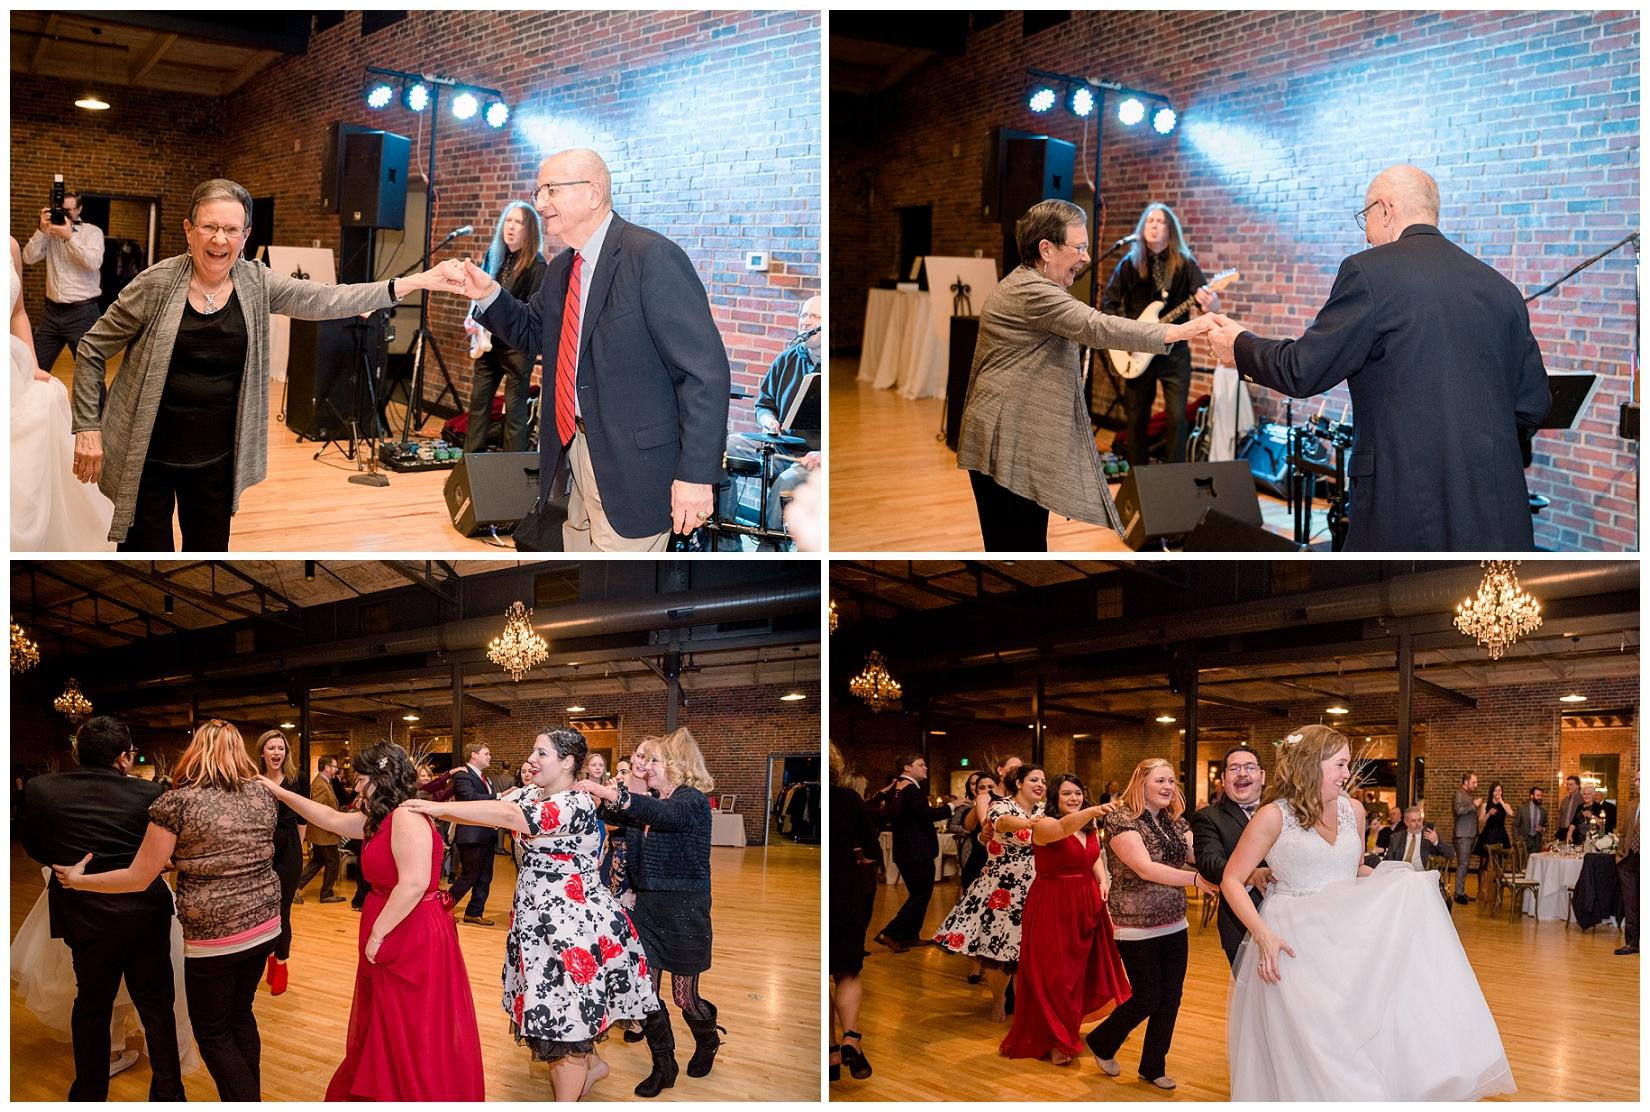 cat-alkire-wedding-photographer-indiana-chicago-indianapolis-fort-wayne_1011.jpg